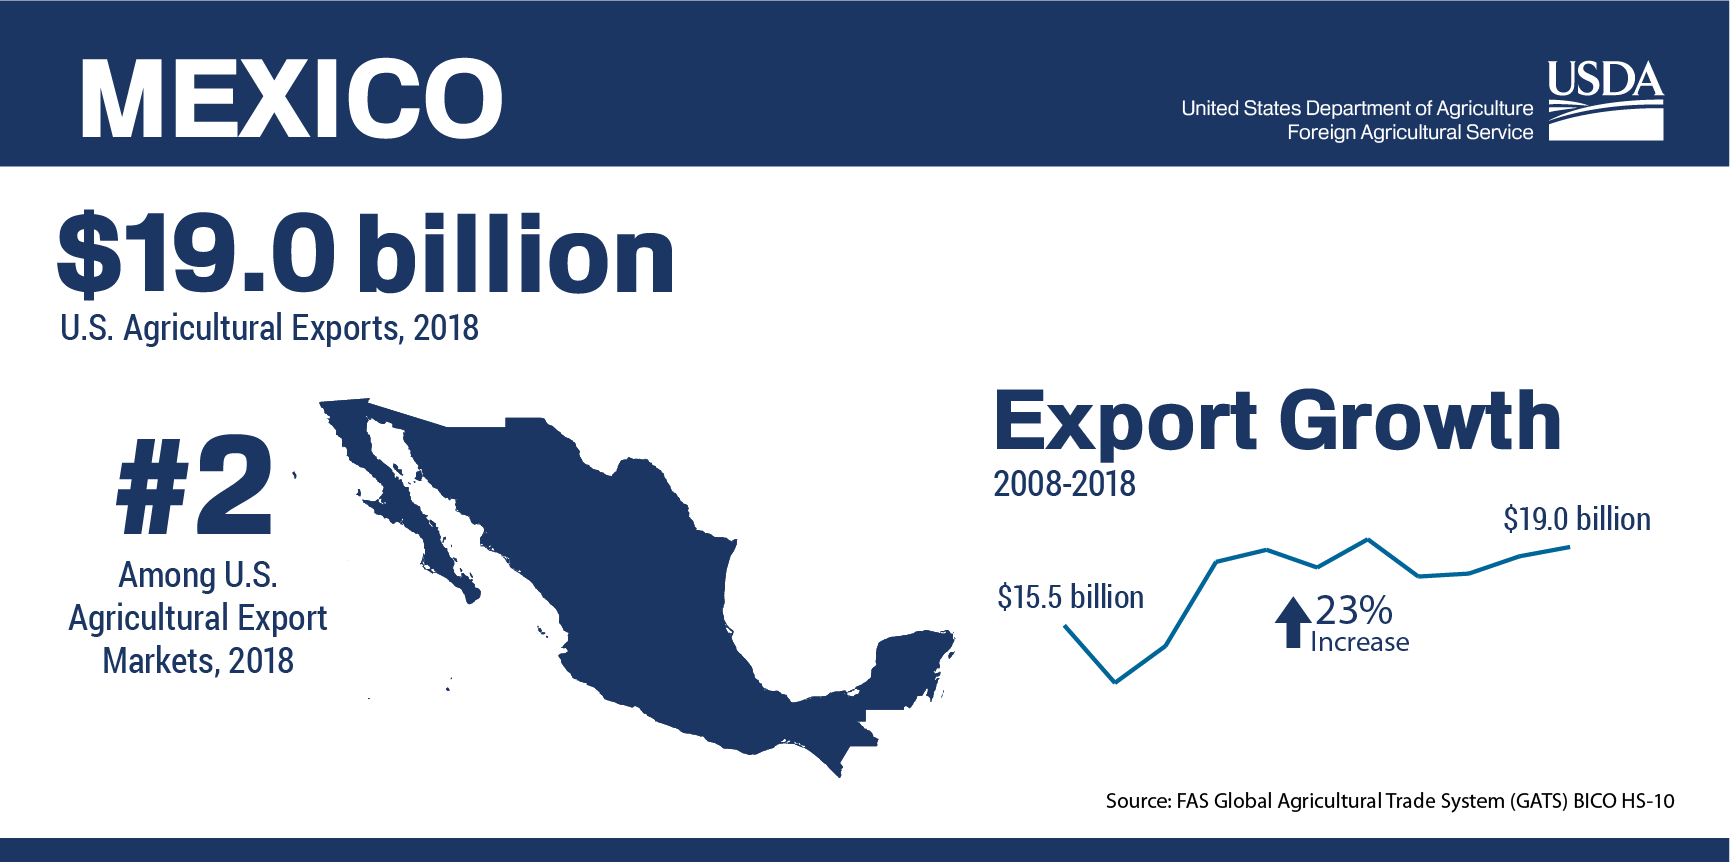 Mexico Trade Mission Nov 2019